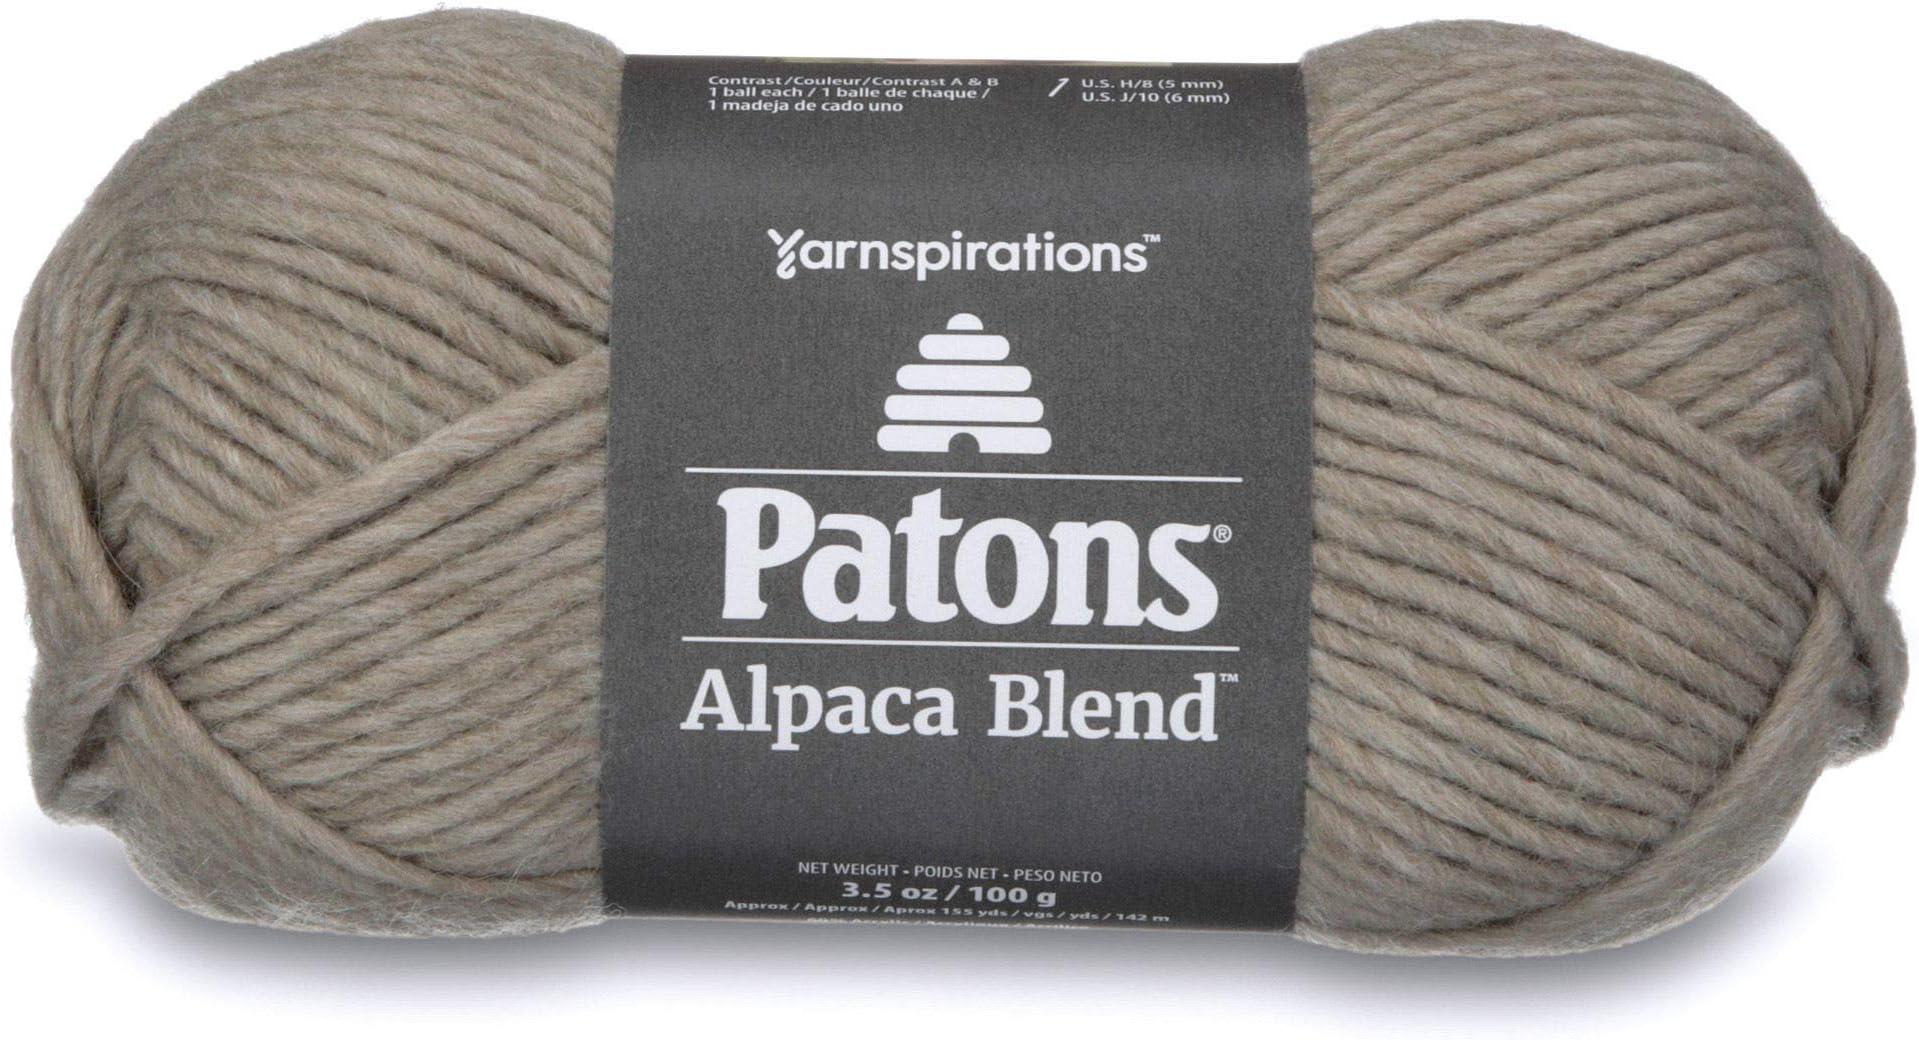 USA product!! Ready to blend 5 ounces Alpaca Blending Fiber Charcoal Gray Prime